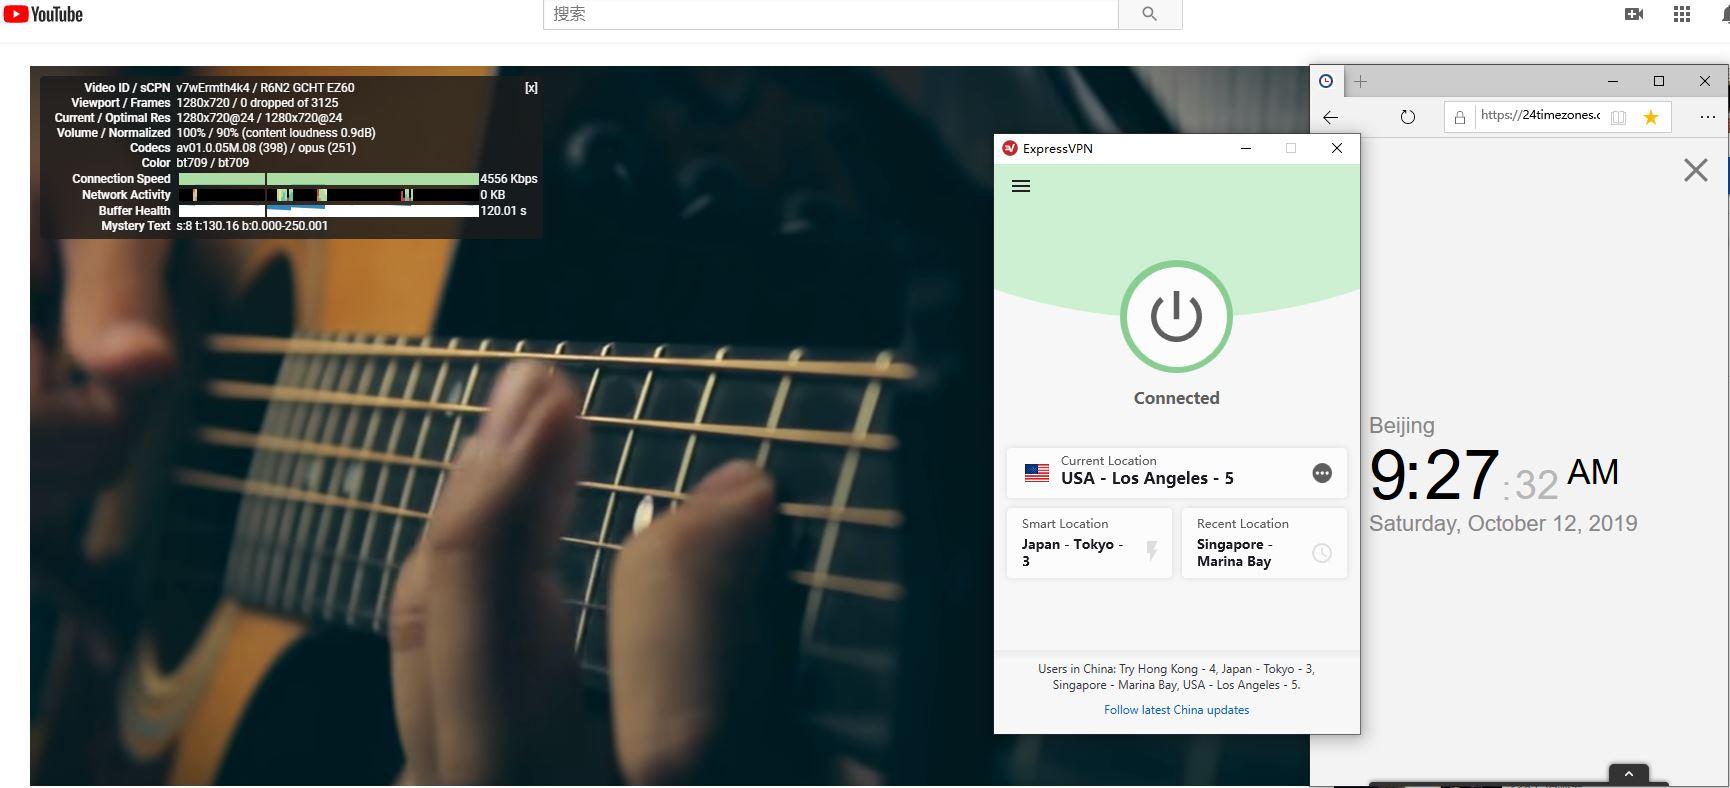 Windows ExpressVPN USA - Los Angeles - 5 中国VPN翻墙 科学上网 YouTube测速 - 20191012